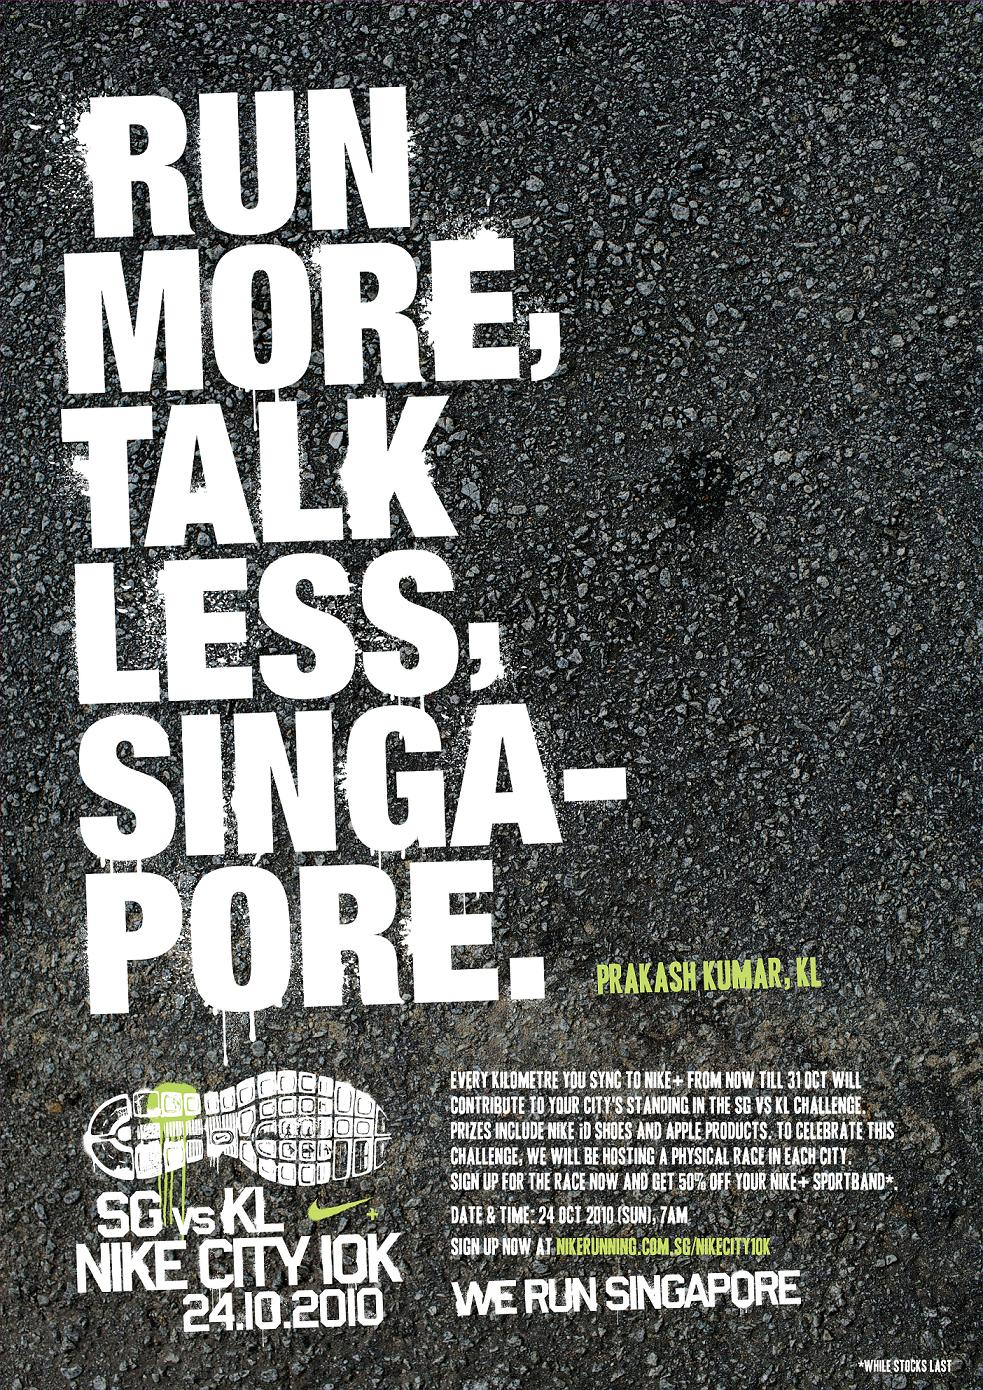 SG vs KL Nike City 10k 24.10.10 | My Running Addiction